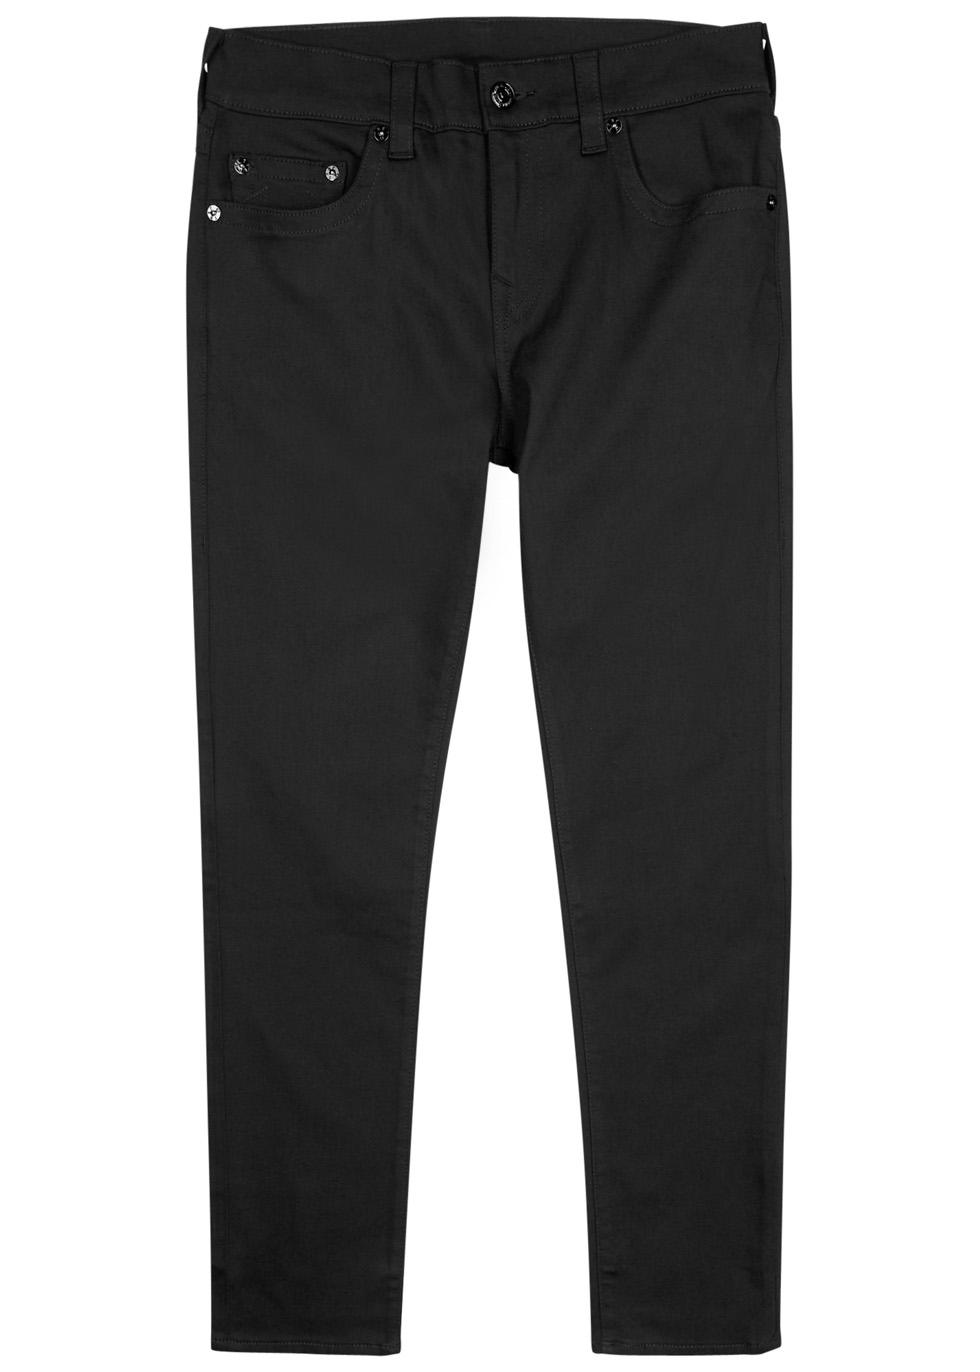 True Religion Rocco Black Skinny Jeans thumbnail